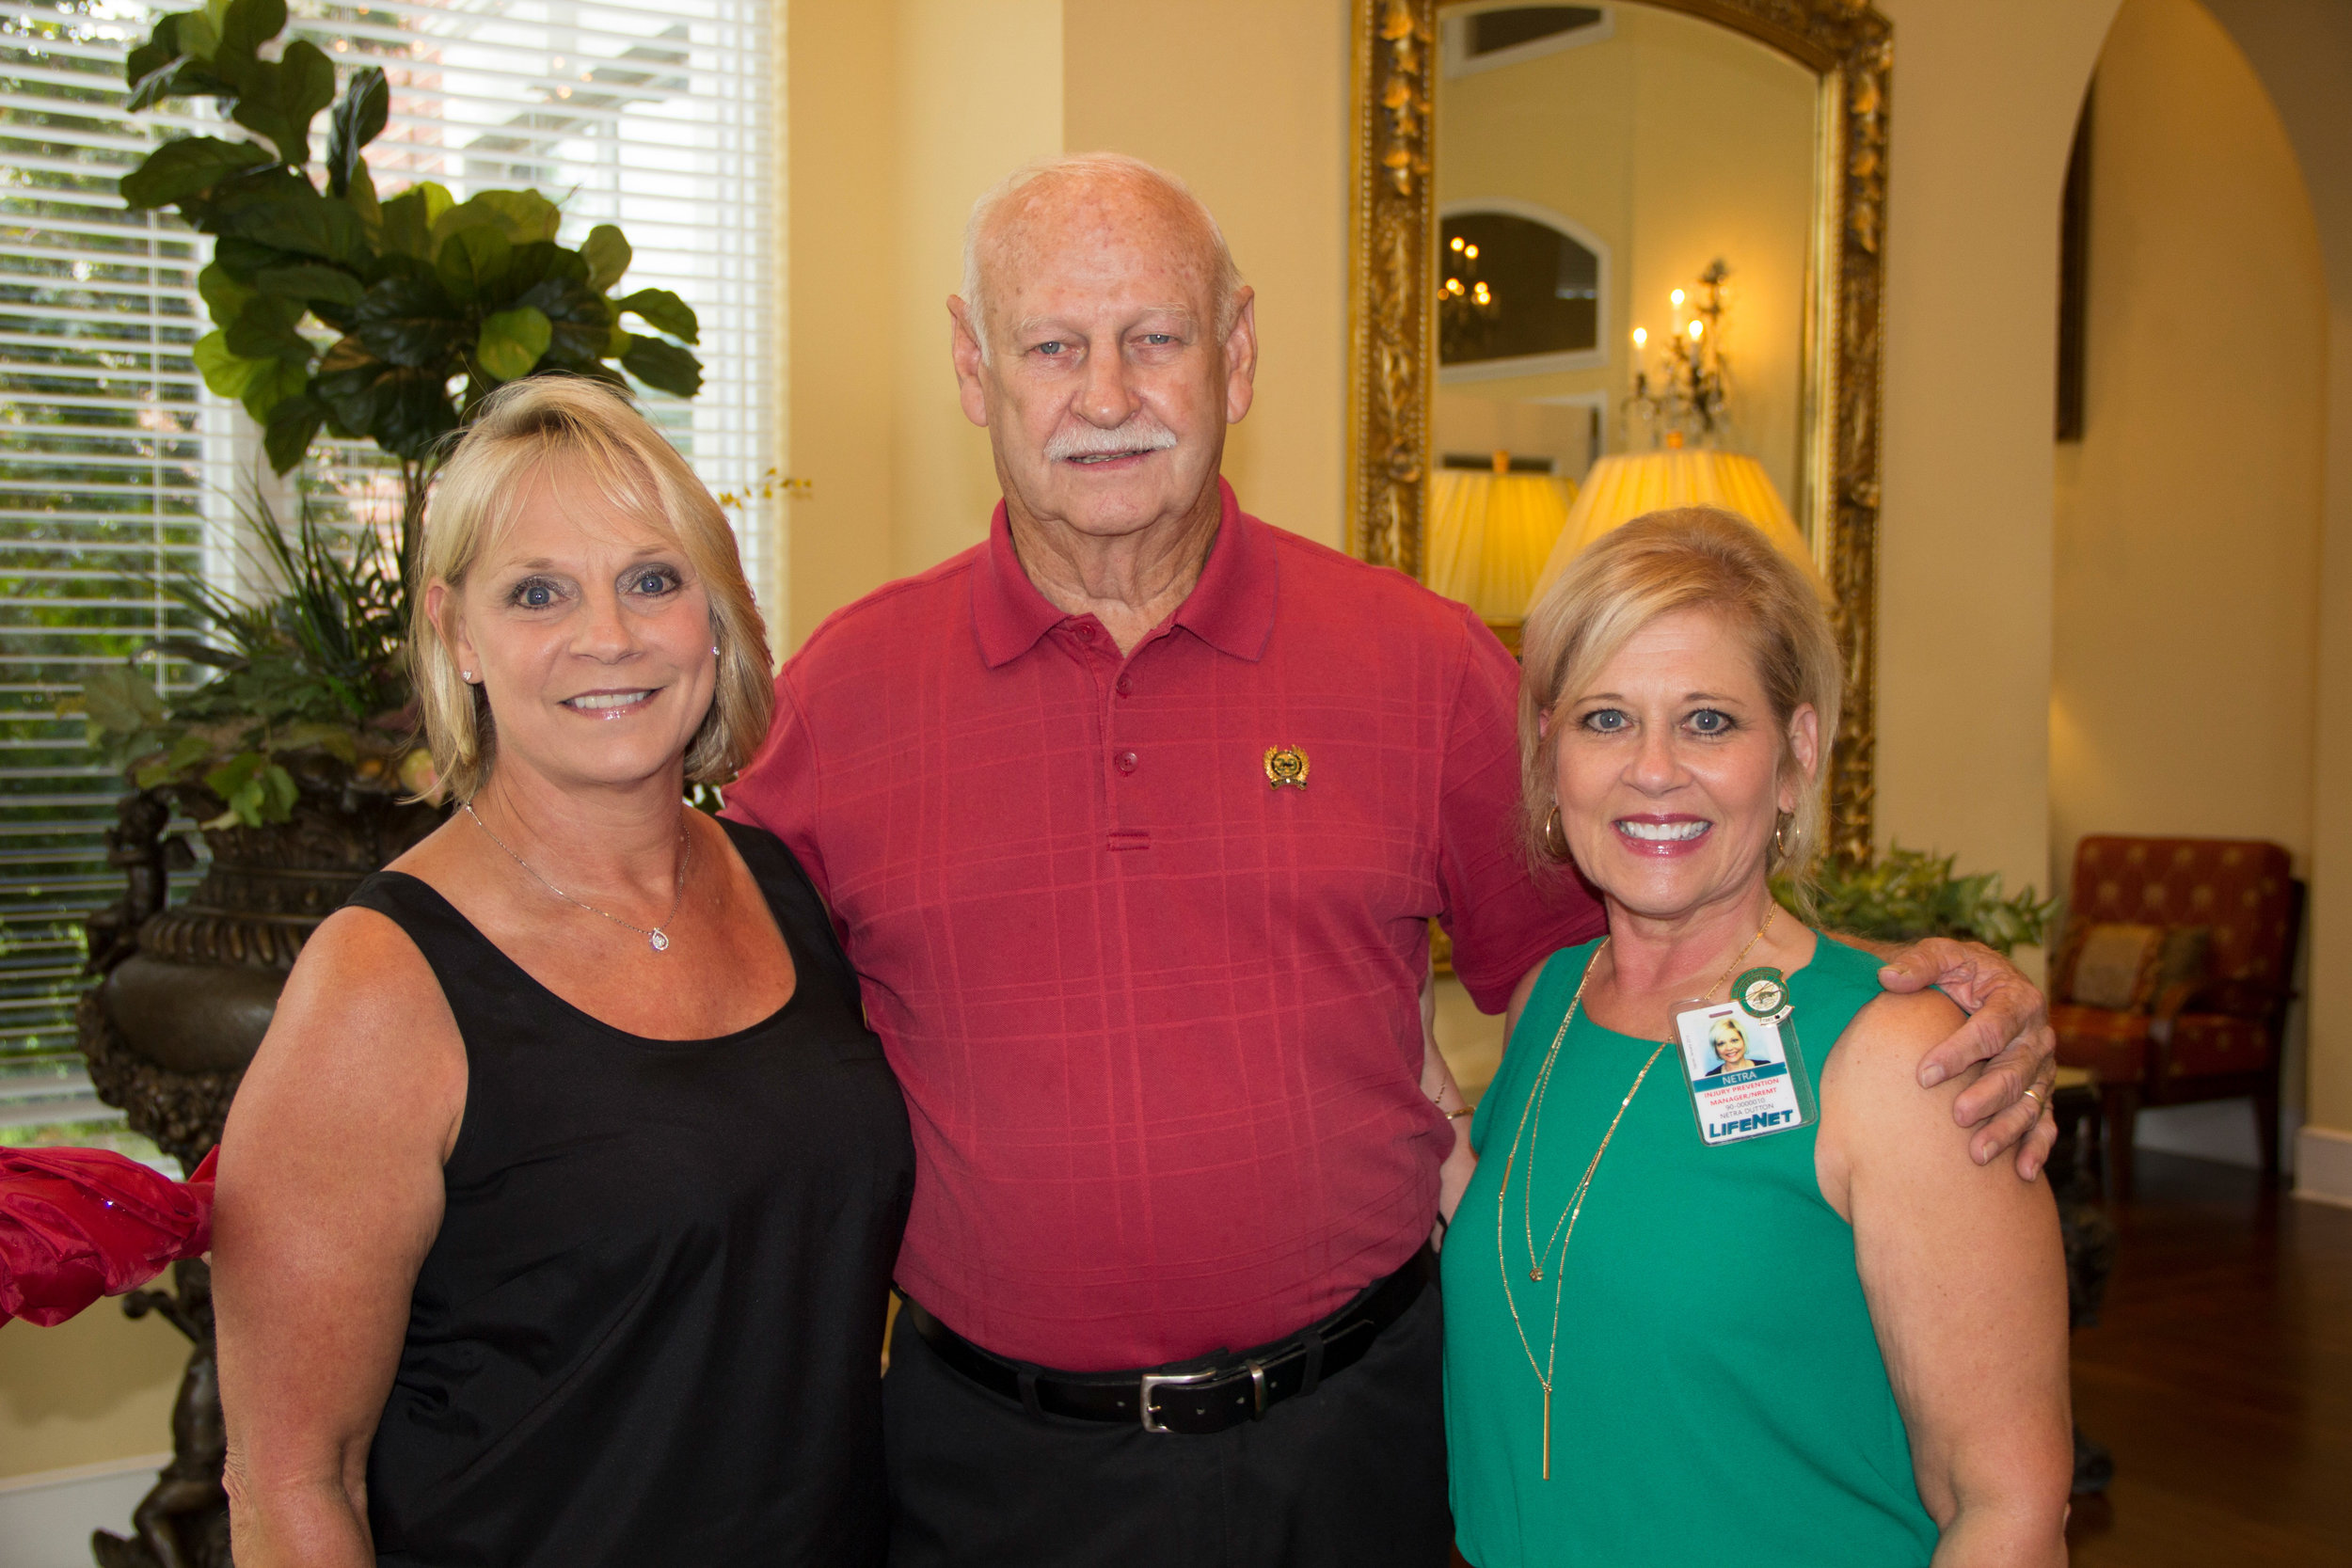 Cindy Smith, Doug Jones and Netra Dutton